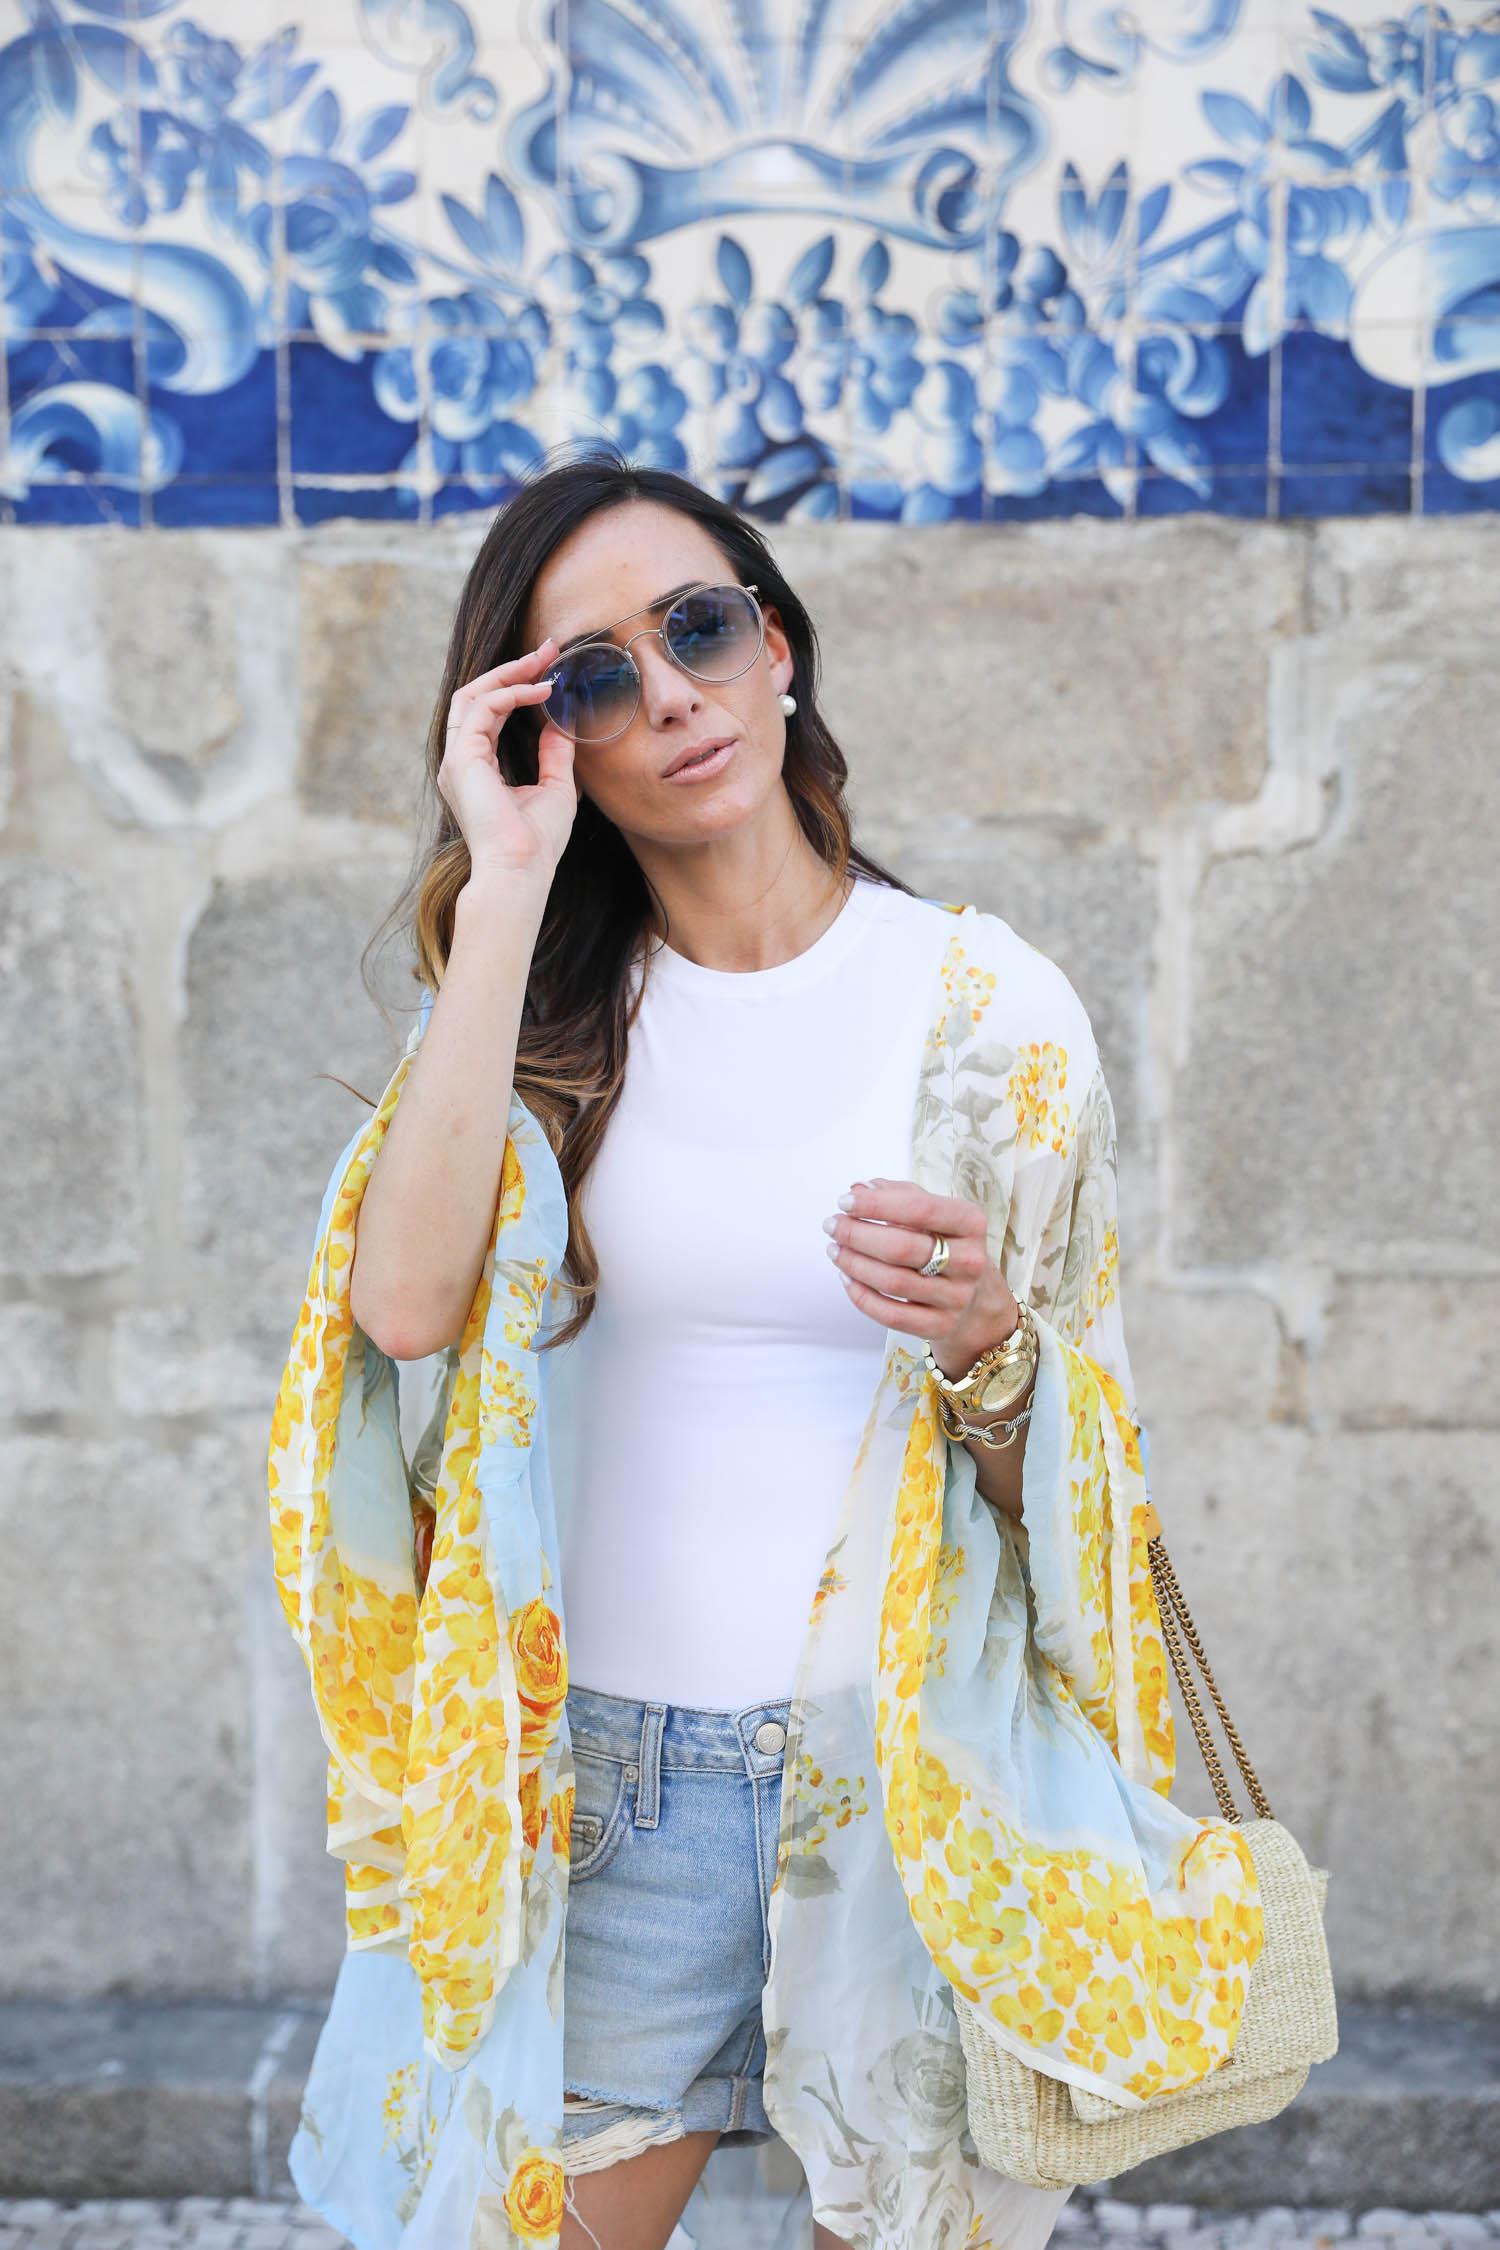 ray-ban round double-bridge sunglasses, sunglasses, sunglasses 2018, mytheresa.com, porto, portugal